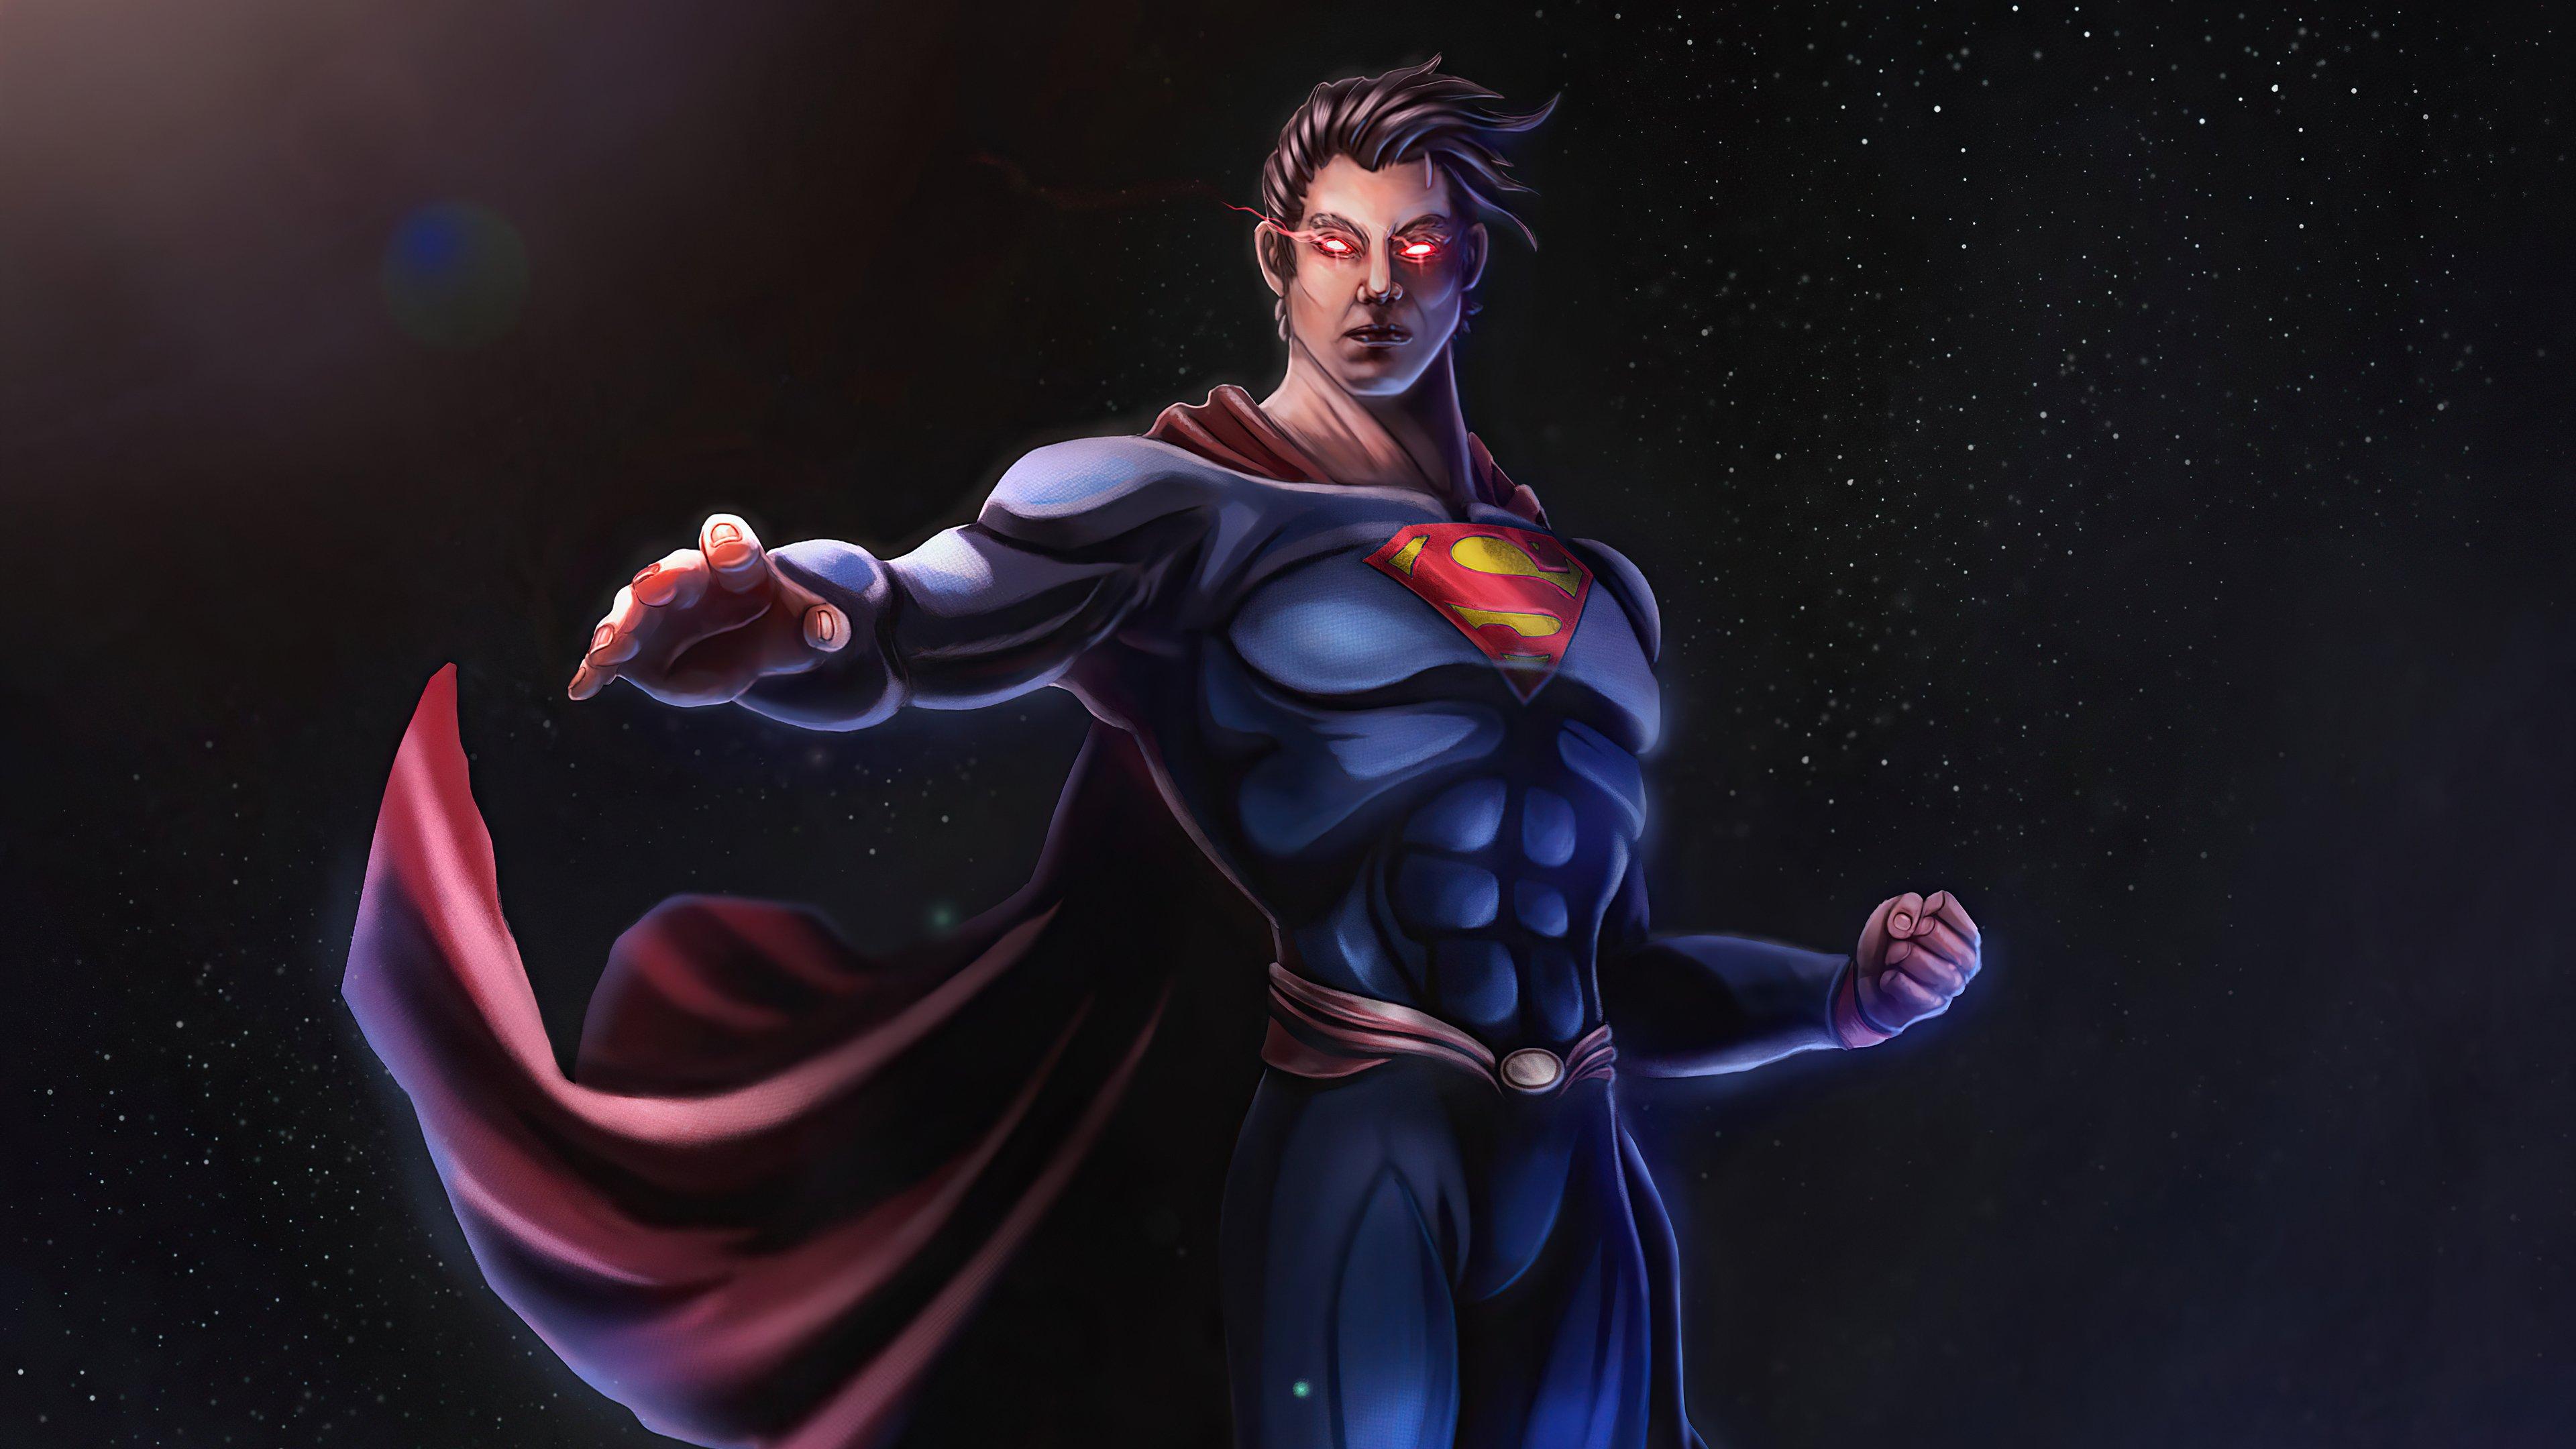 Wallpaper Superman Man of steel Comic Art